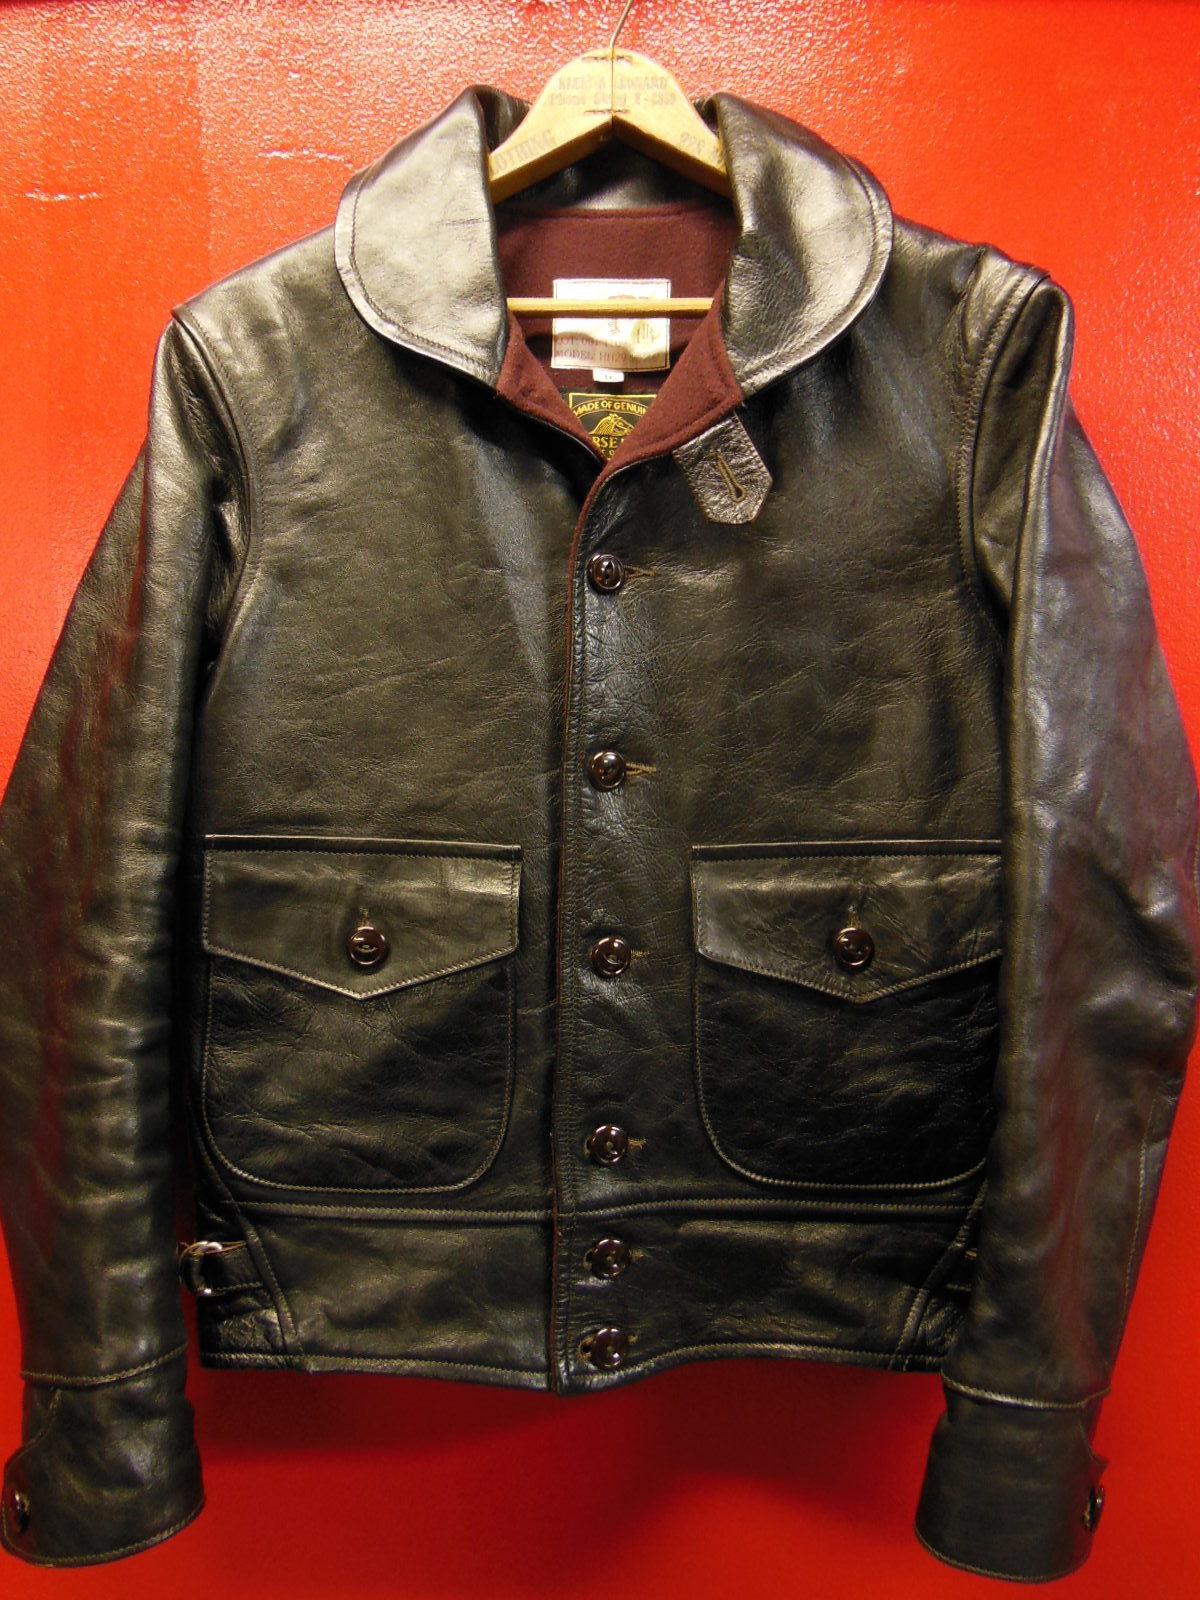 USED HIMEL BROTHERS LEATHER HERON 1929/新喜皮革製黒ホースハイド/SIZE-36/ボタンフロント A-1 ジャケット_c0187684_14580422.jpg